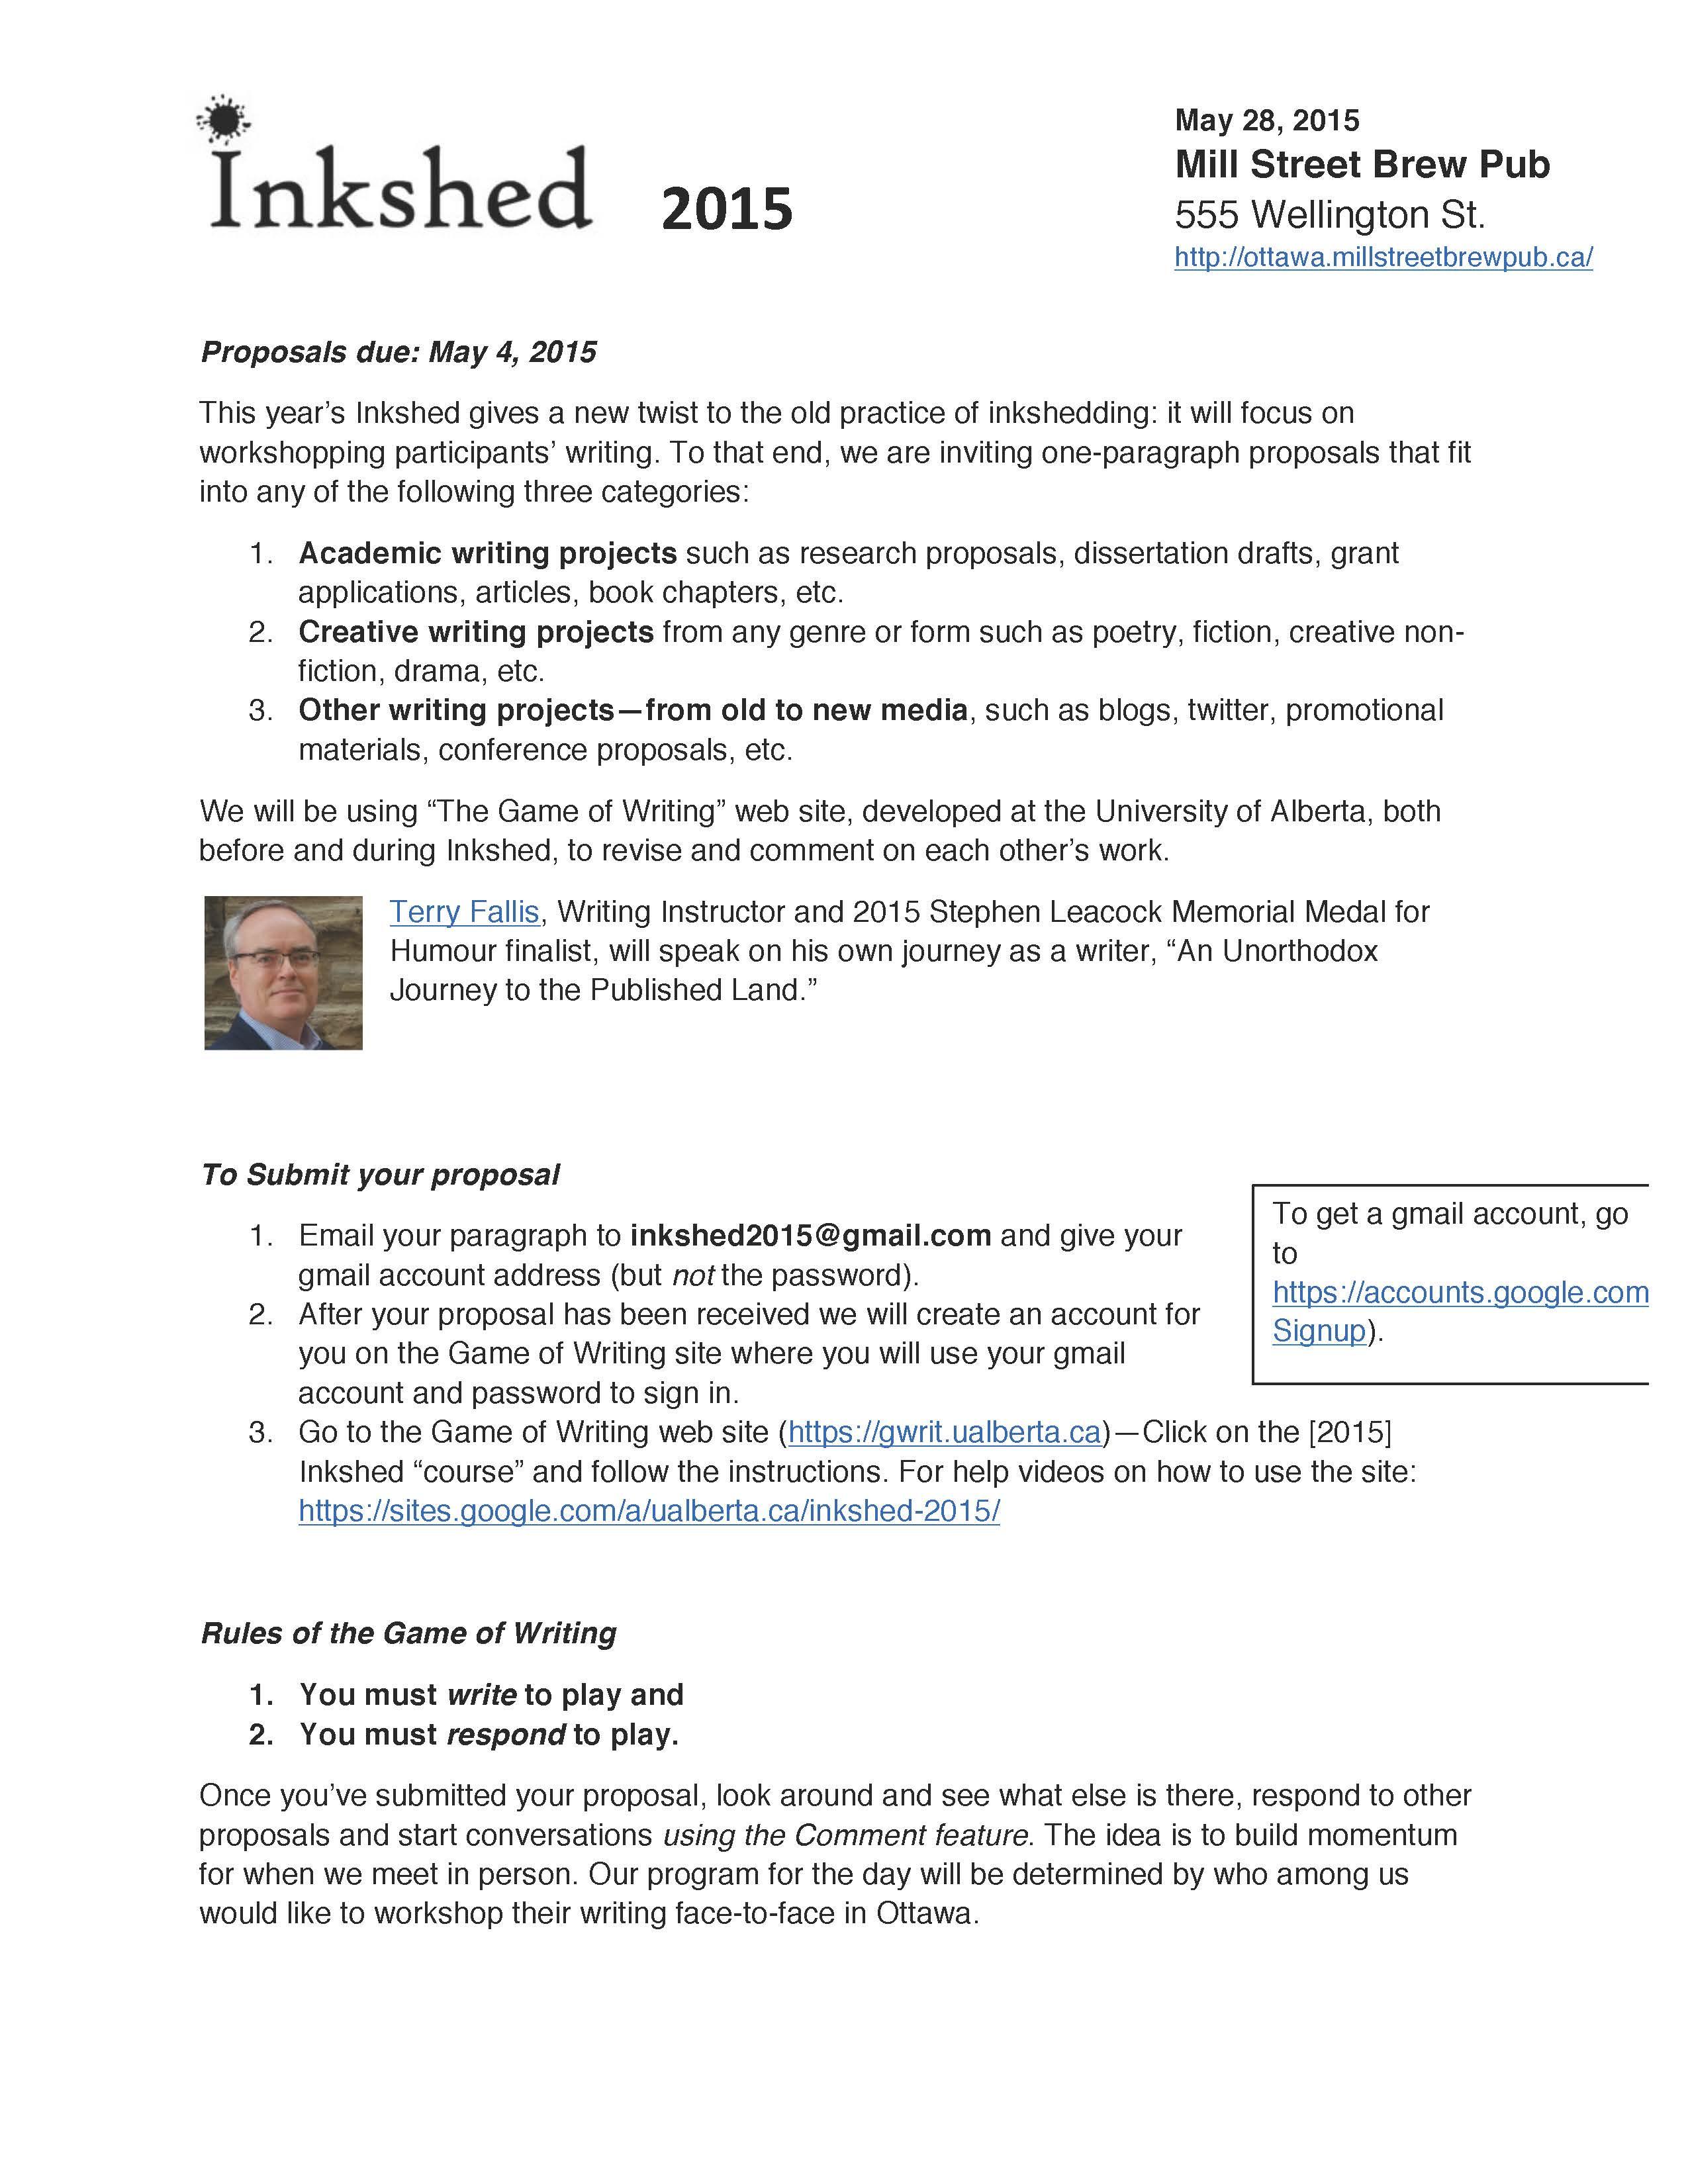 027 Professional Dissertation Proposal Writing Site Usa Njhs Essay Conclusion Unique Full